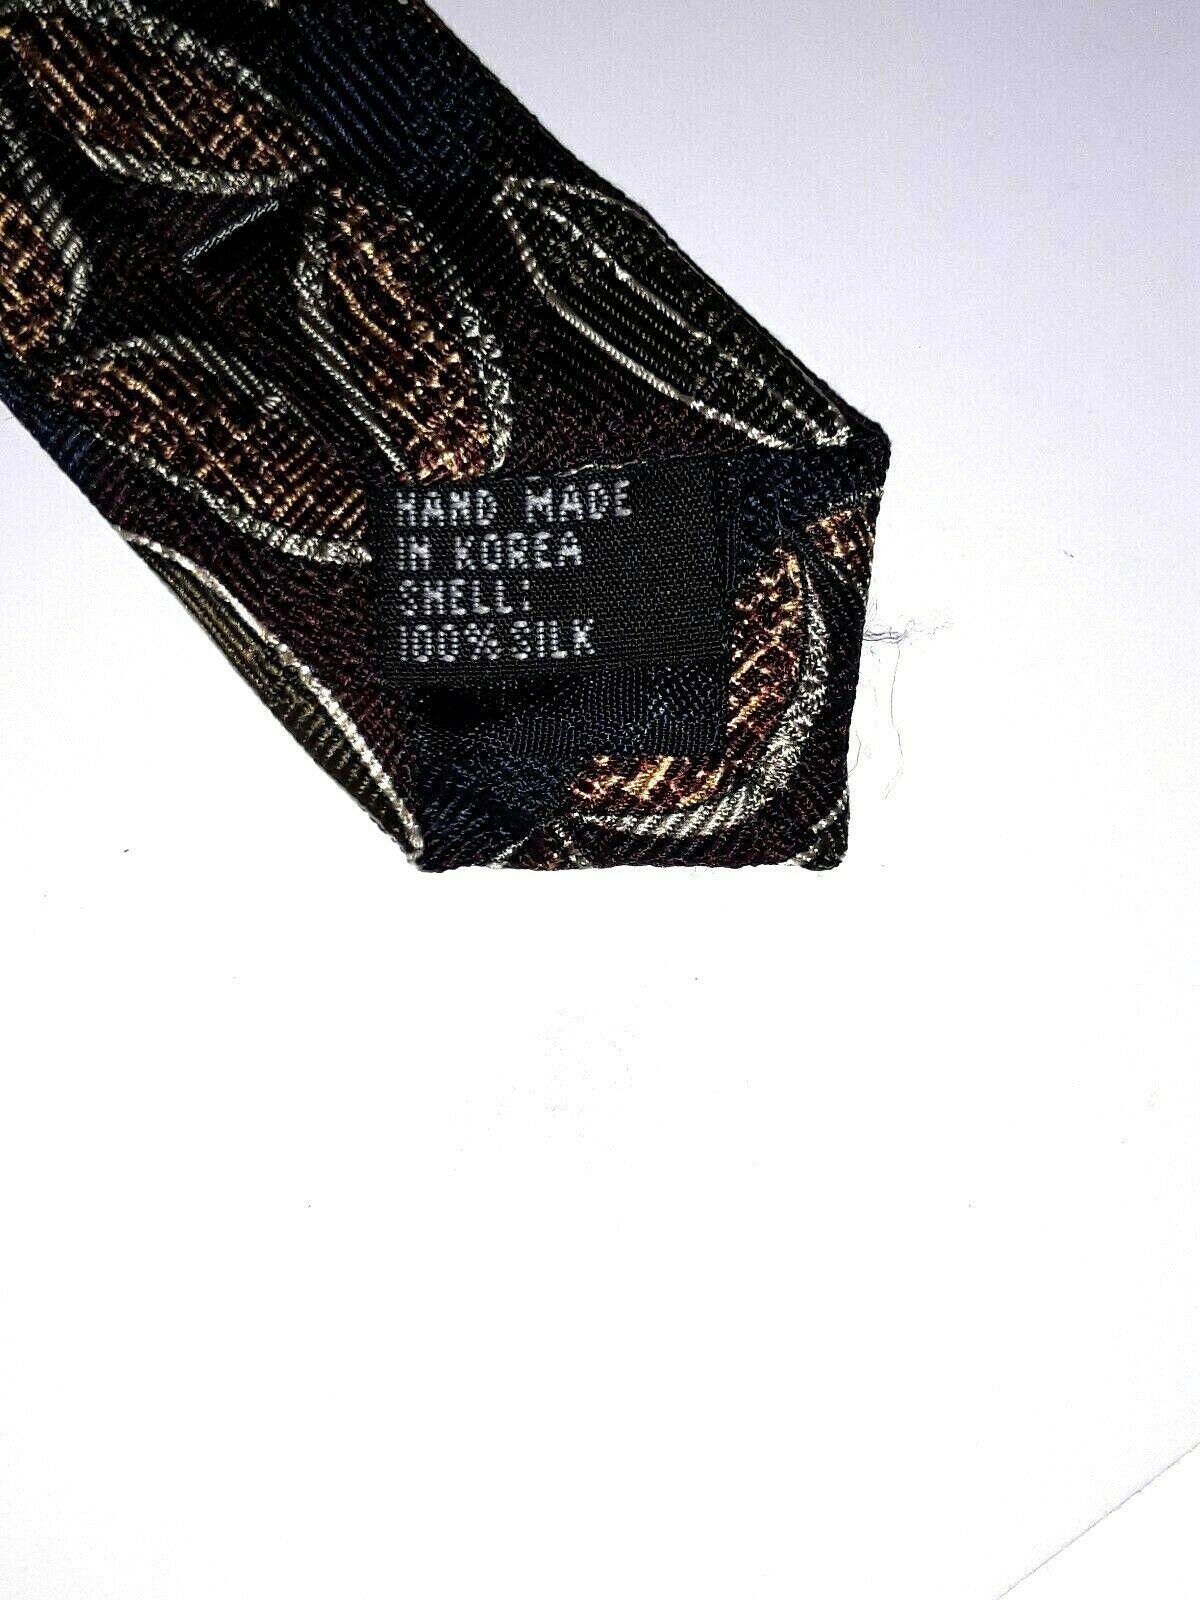 "Louis Roth Men's Tie Necktie 100% Silk Gold Black Burgundy Geometric 59"" x 4"" image 5"